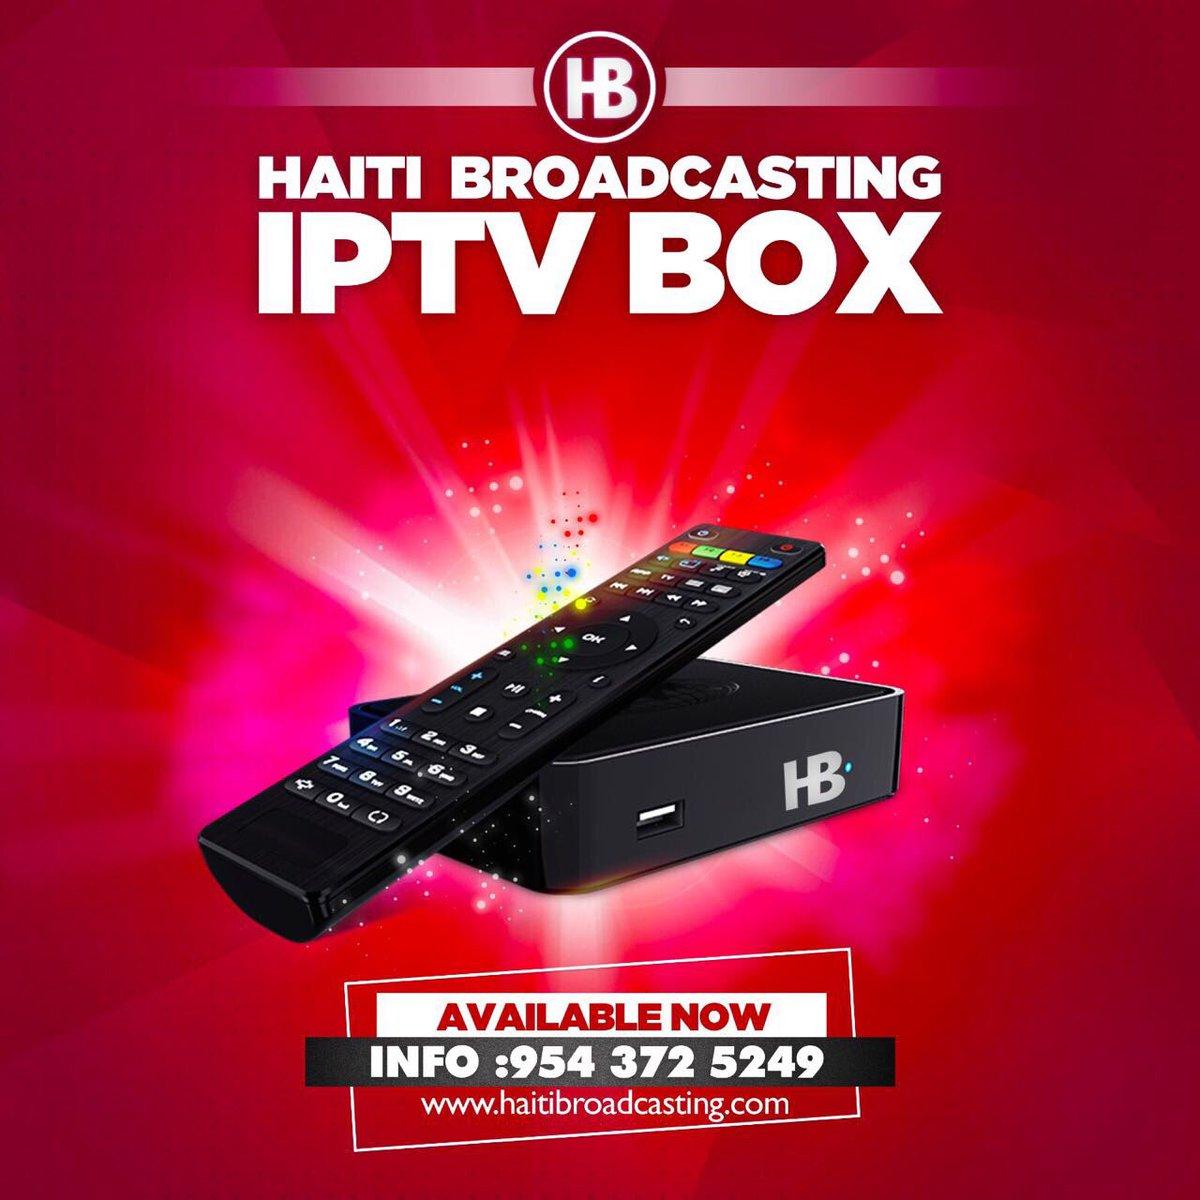 Haiti Broadcasting LLC on Twitter: